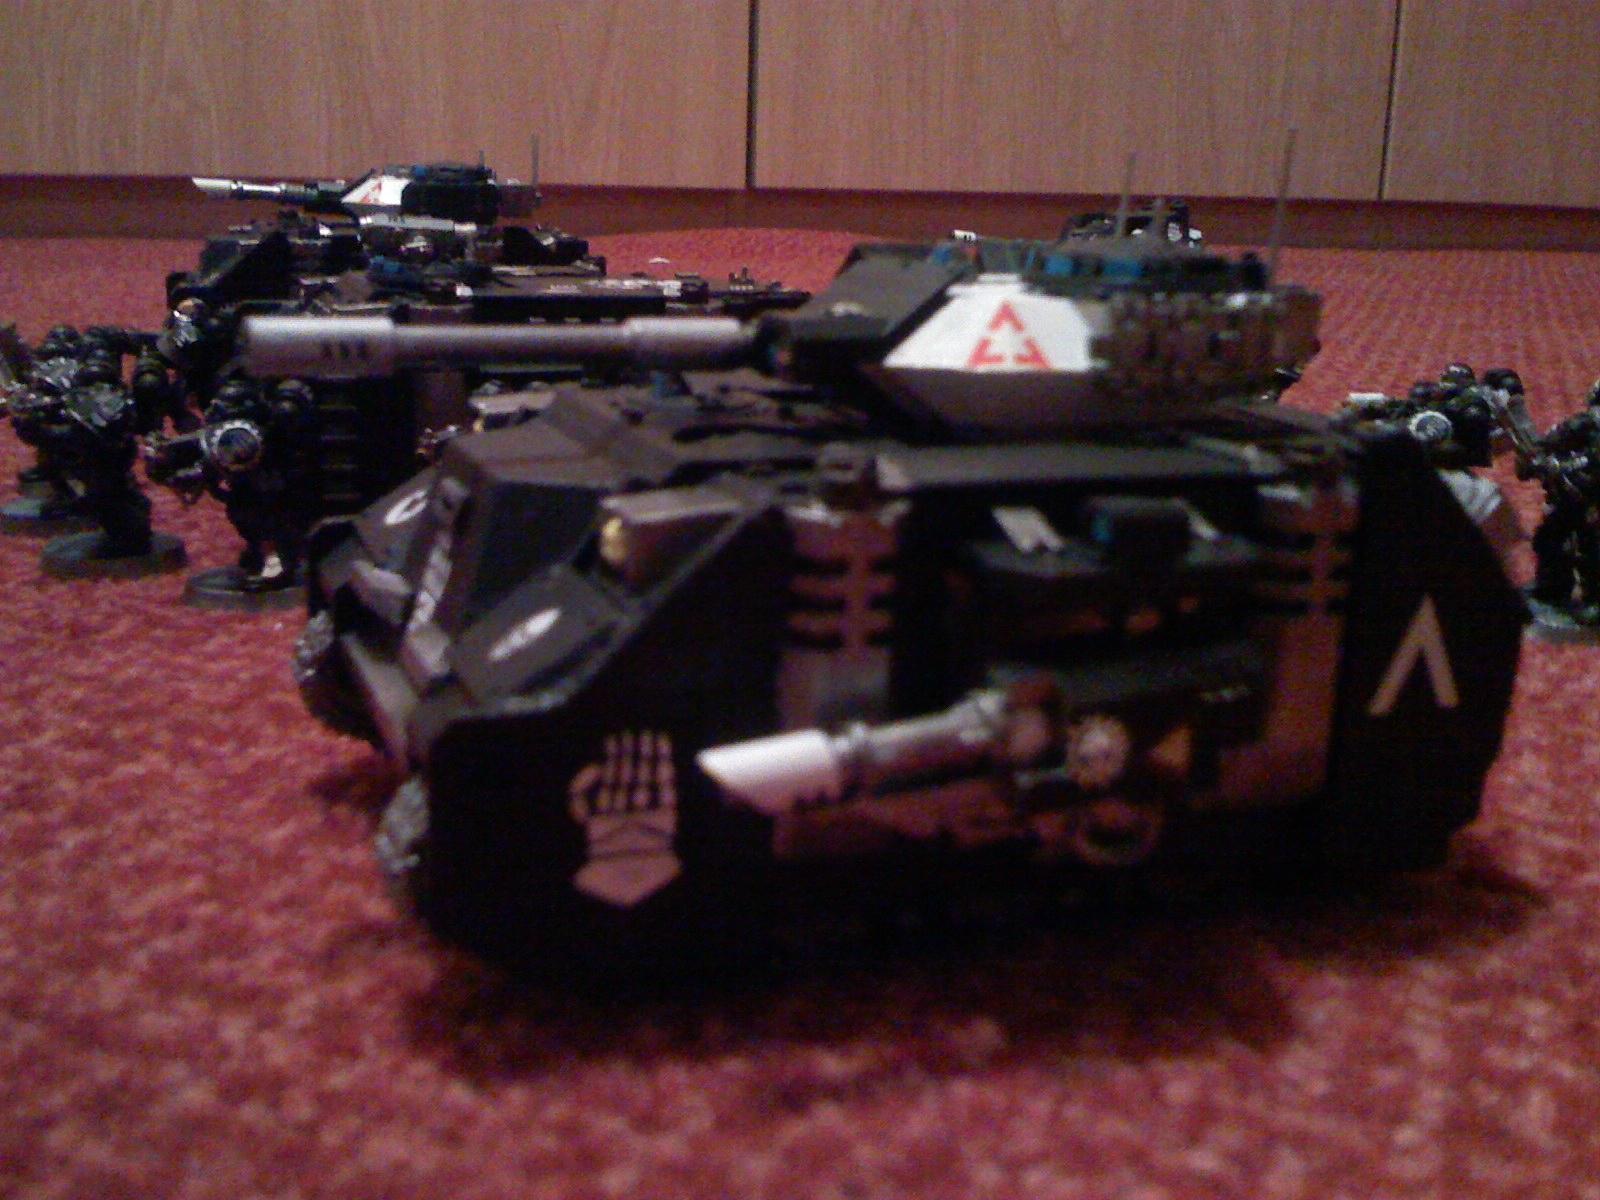 Iron Hands, Predator, Space Marines, Warhammer 40,000